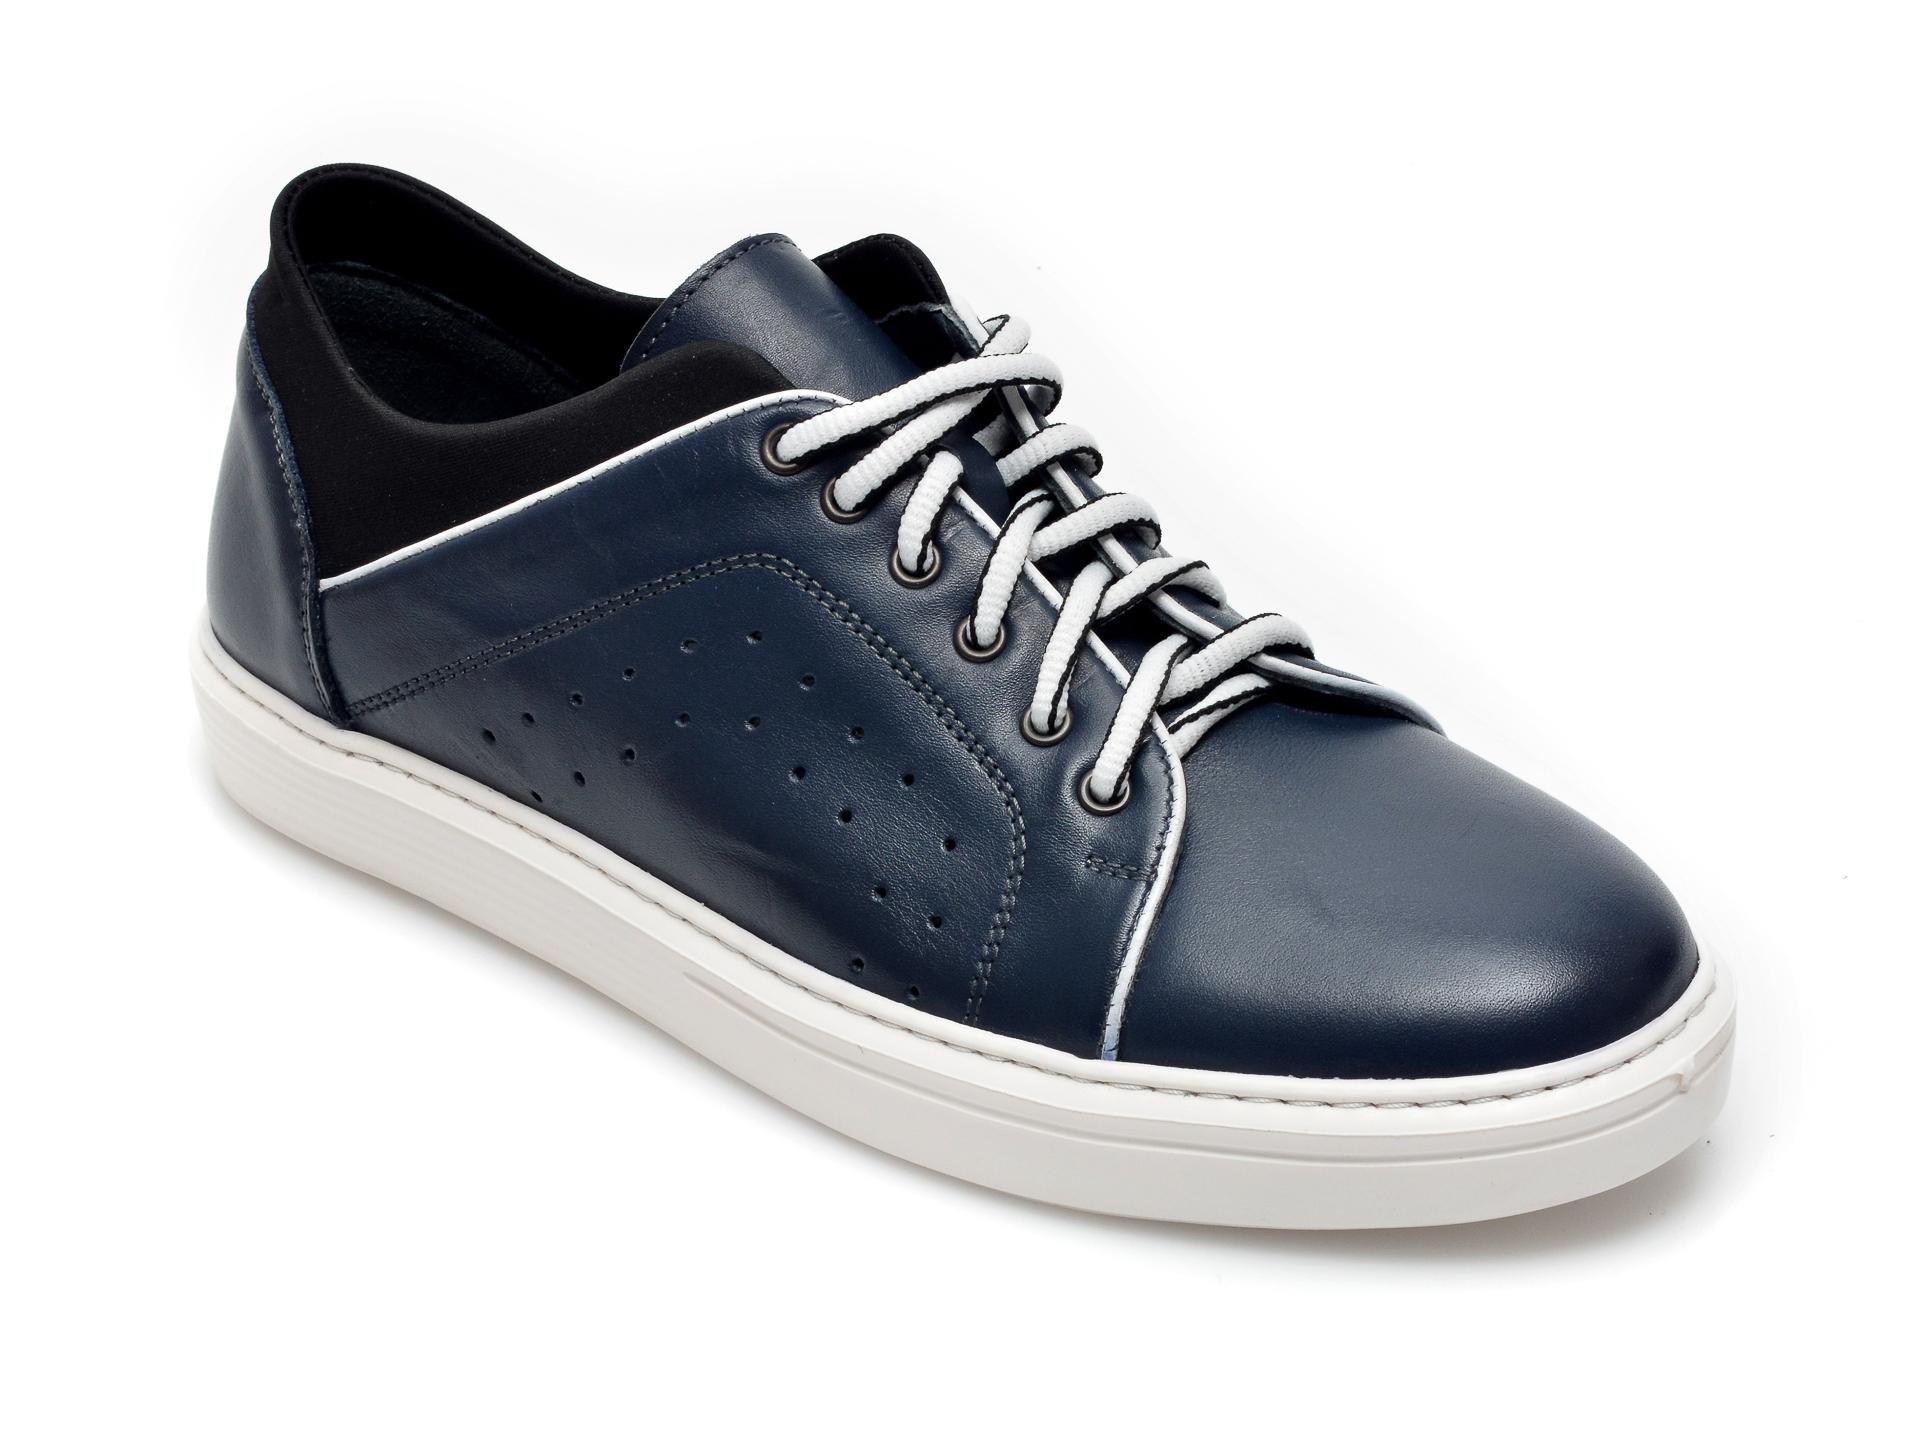 Pantofi OTTER bleumarin, 959, din piele naturala imagine otter.ro 2021